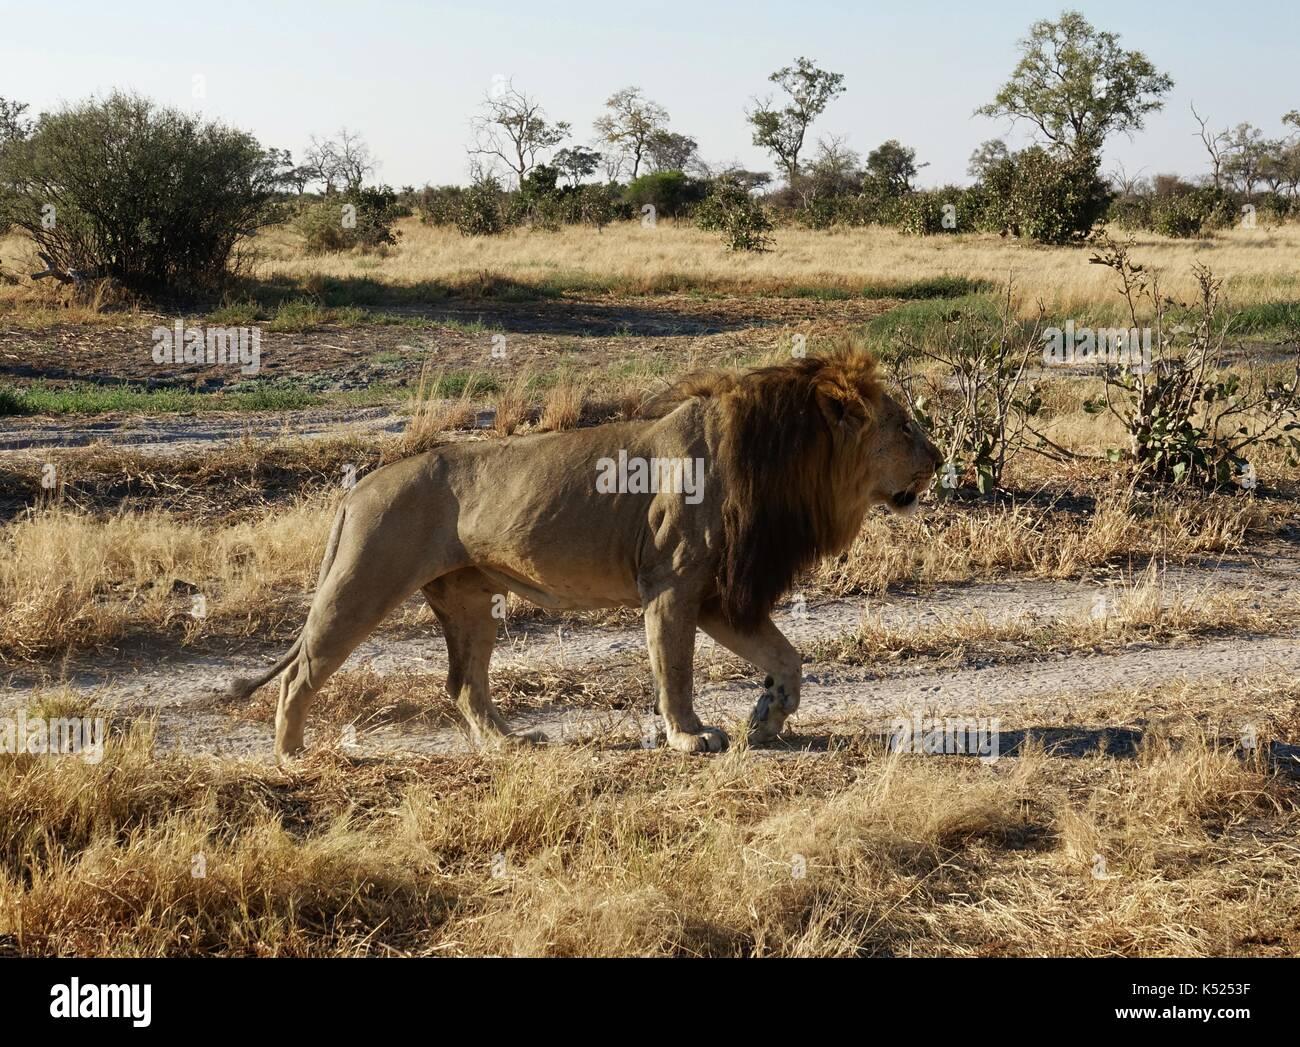 Male lion walking in morning sun - Stock Image